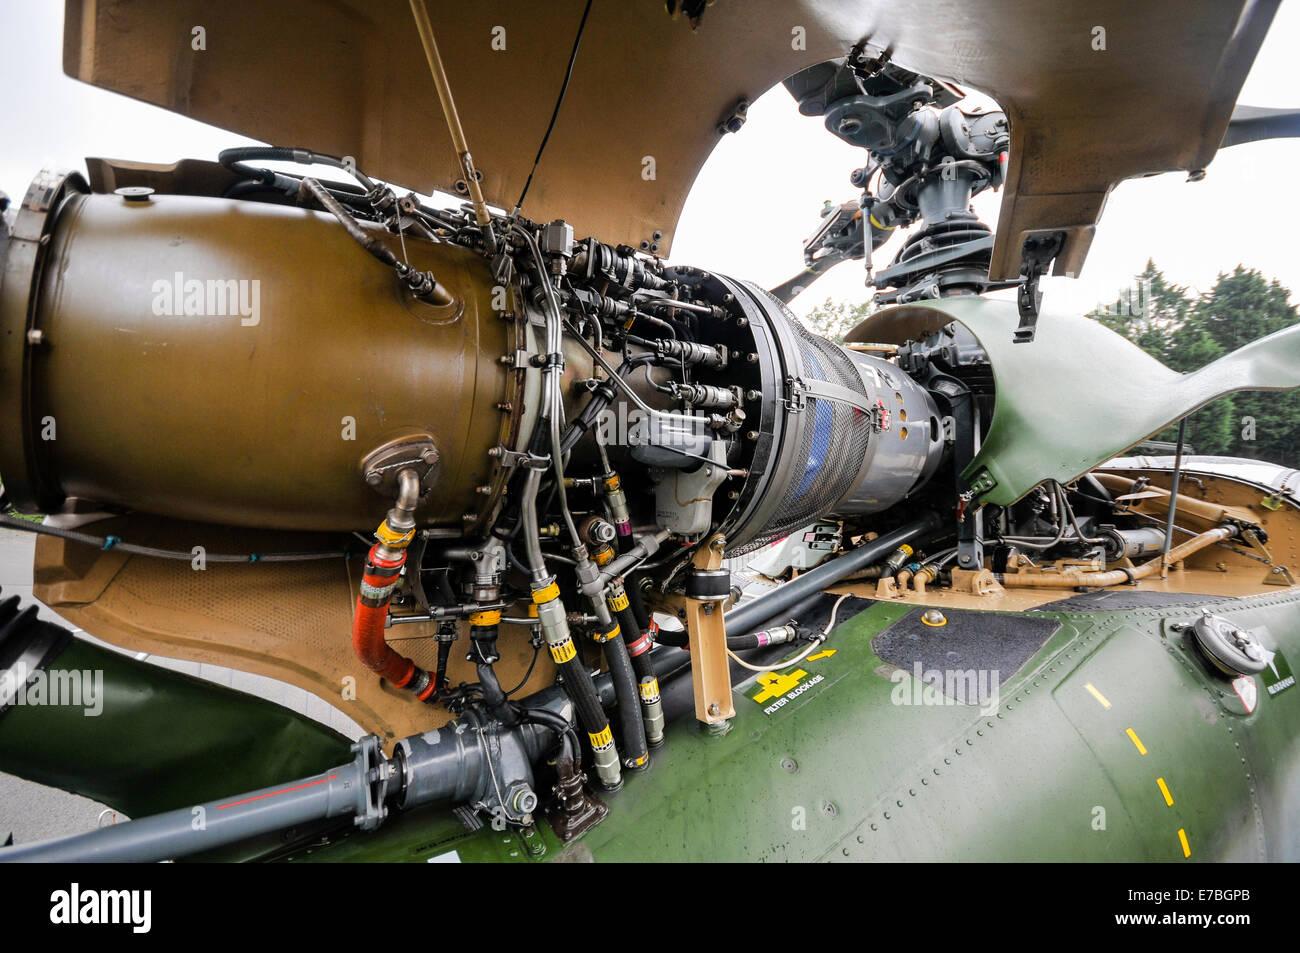 Gas turbine engine on an Aerospaciale Gazelle military helicopter - Stock Image